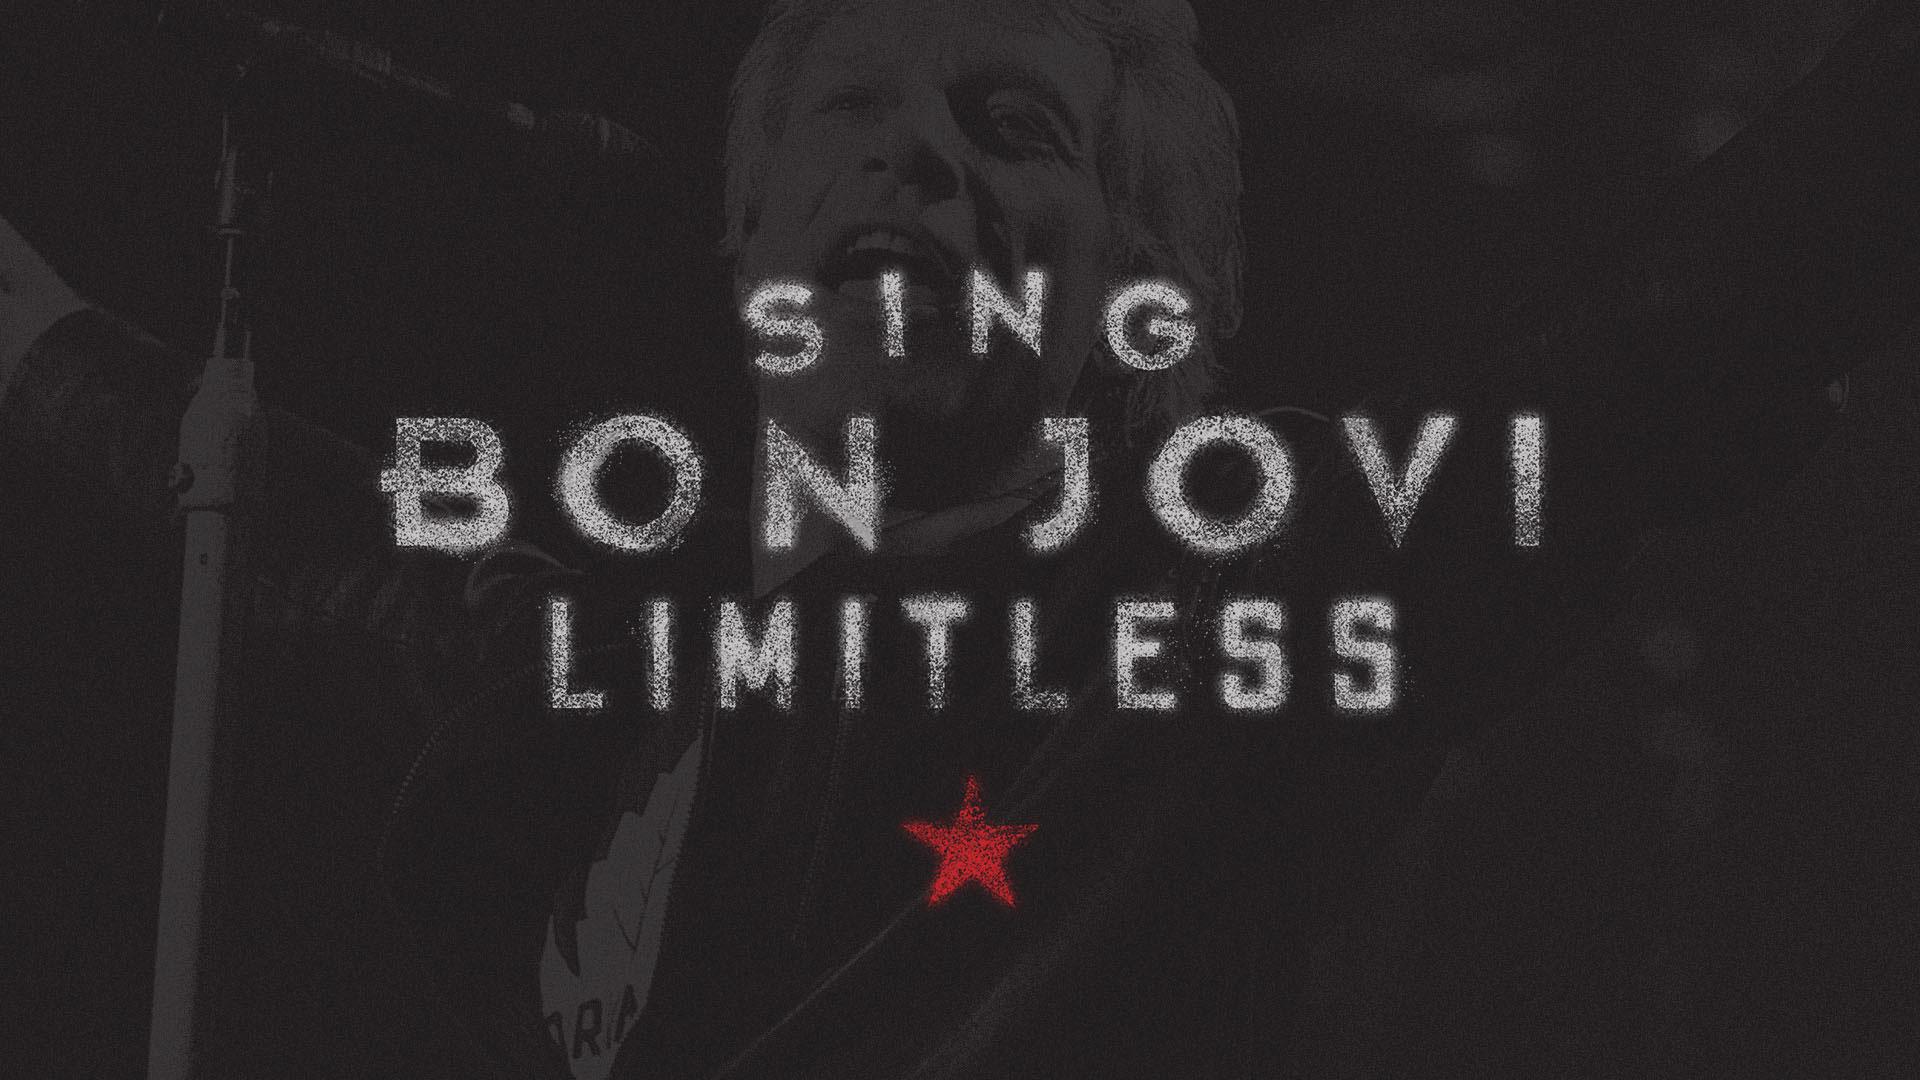 bon-jovi-limitless-hed-2020.jpg